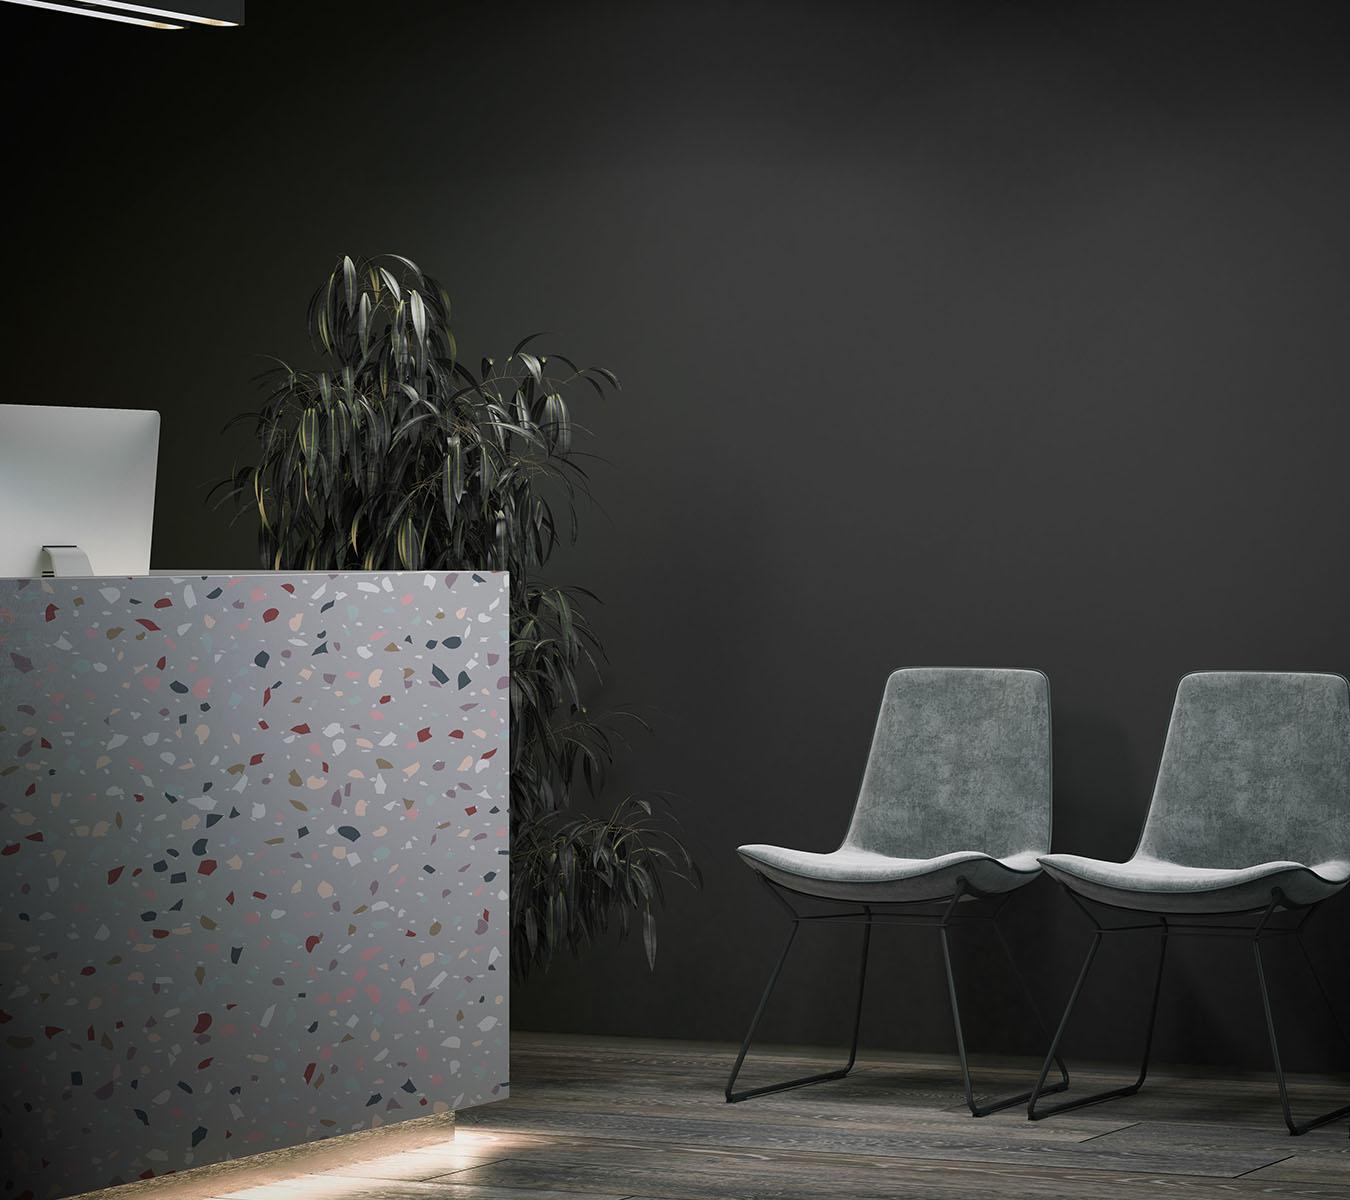 Terrazzo Counter, MODS by Melatone